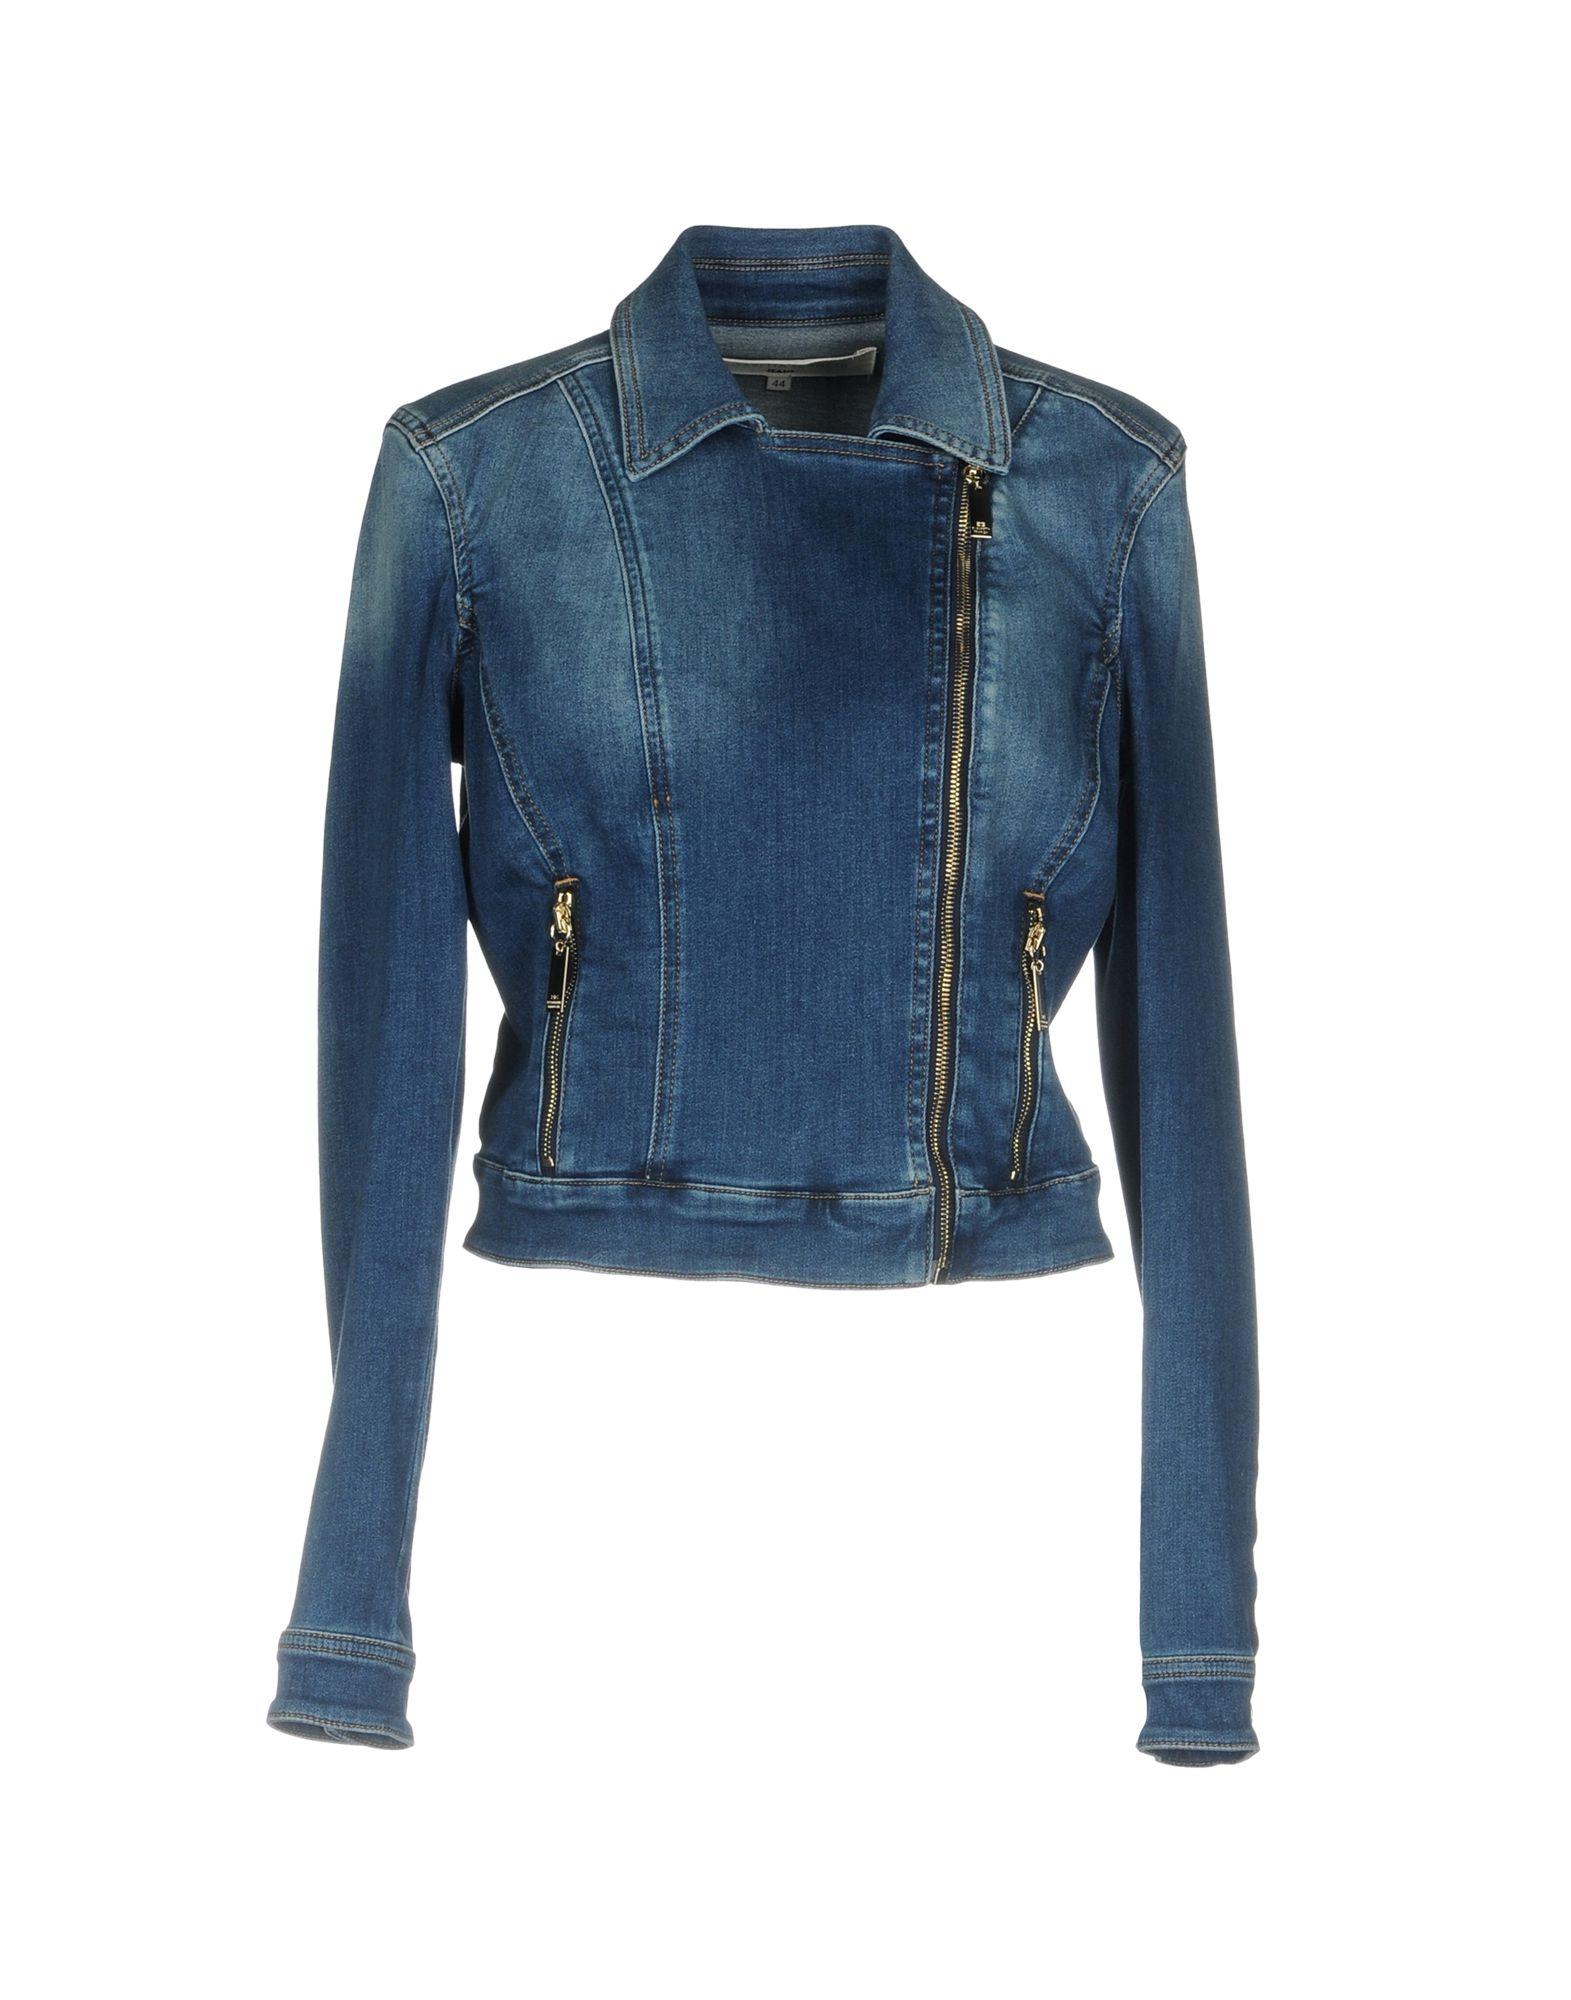 ELISABETTA FRANCHI JEANS Джинсовая верхняя одежда elisabetta franchi jeans футболка